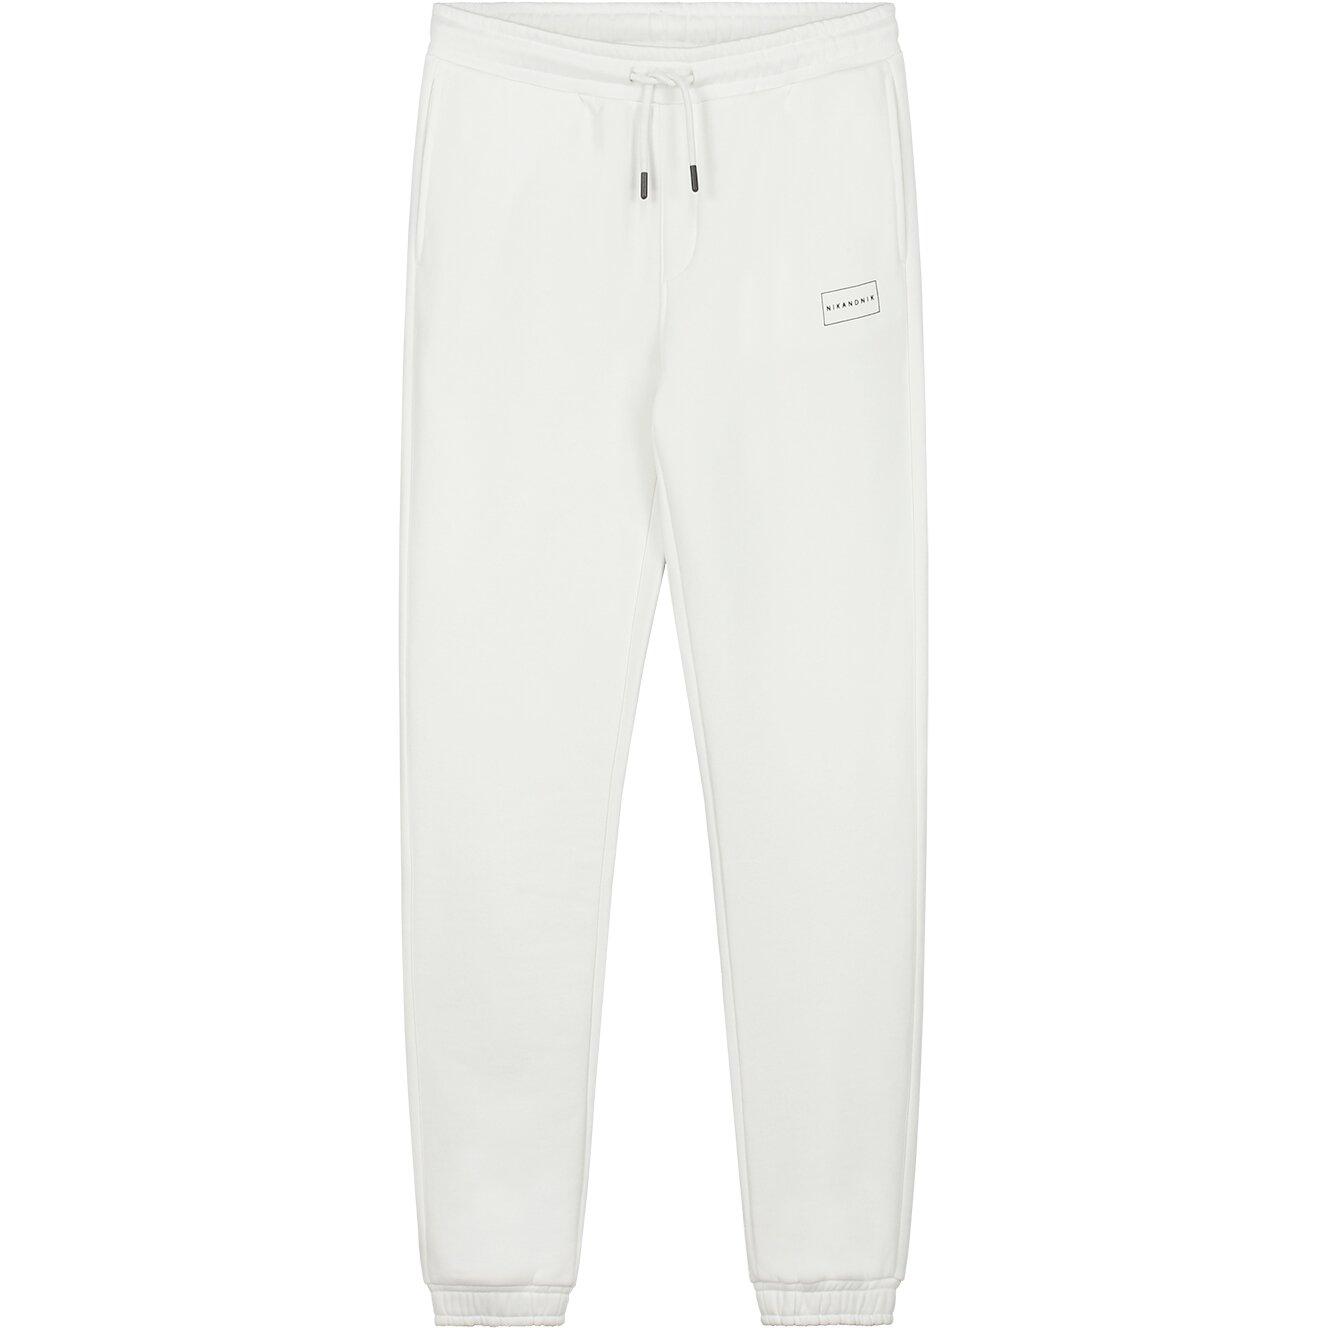 Nik & Nik sweatpants star white Q2583